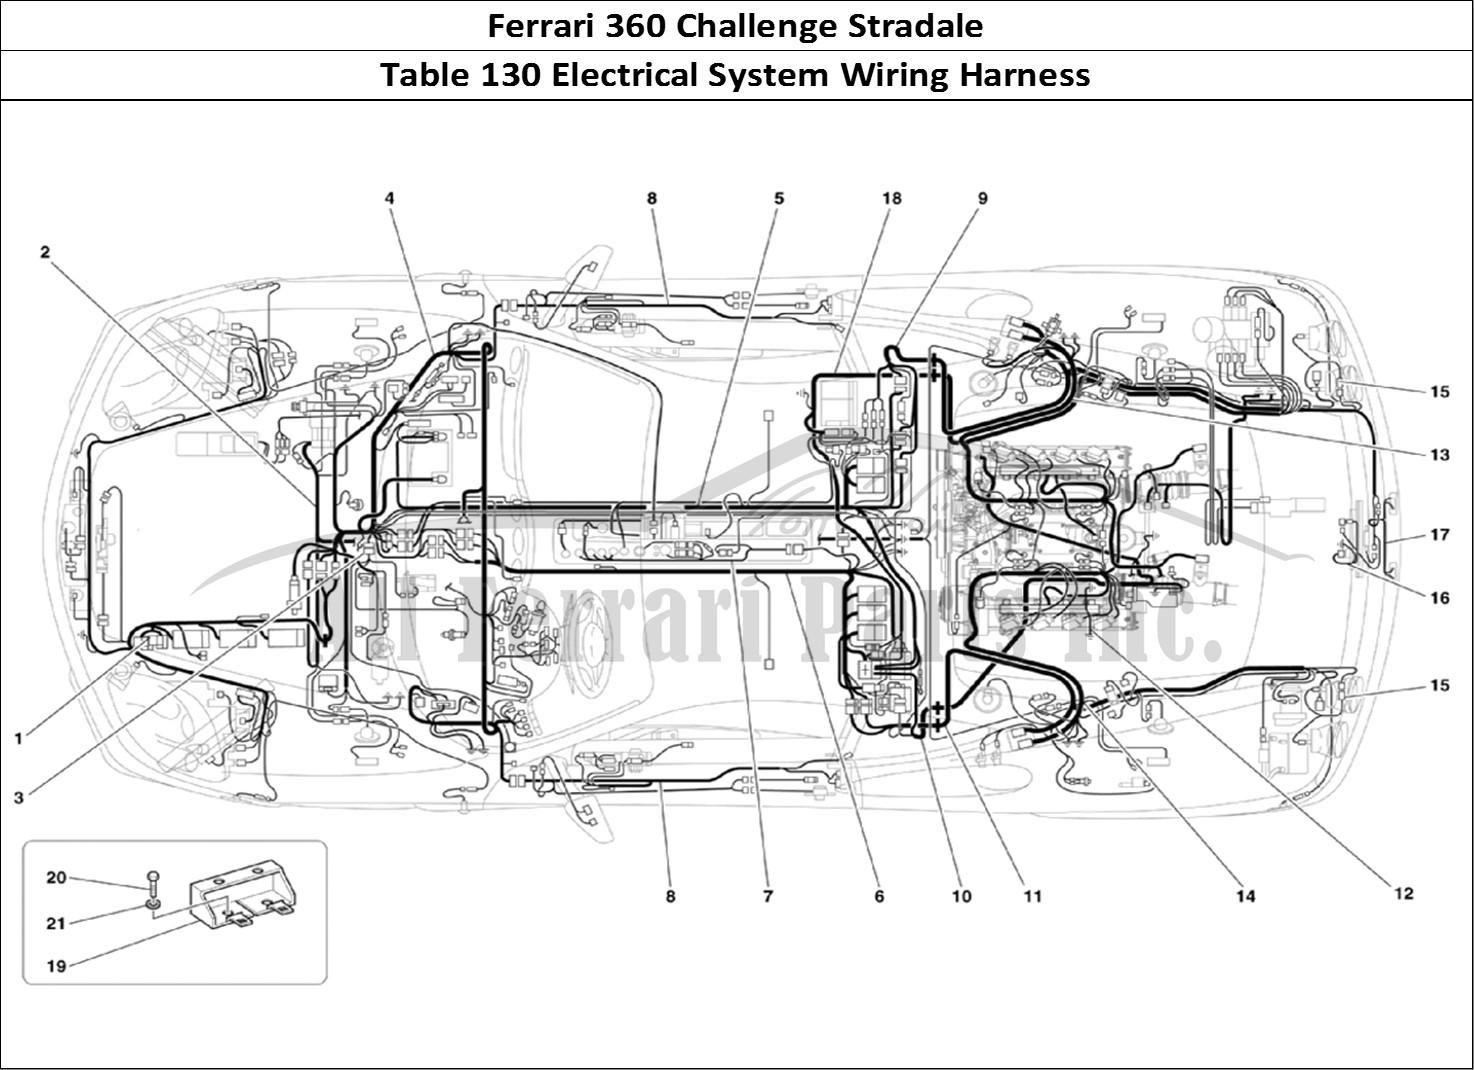 Buy Original Ferrari 360 Challenge Stradale 130 Electrical